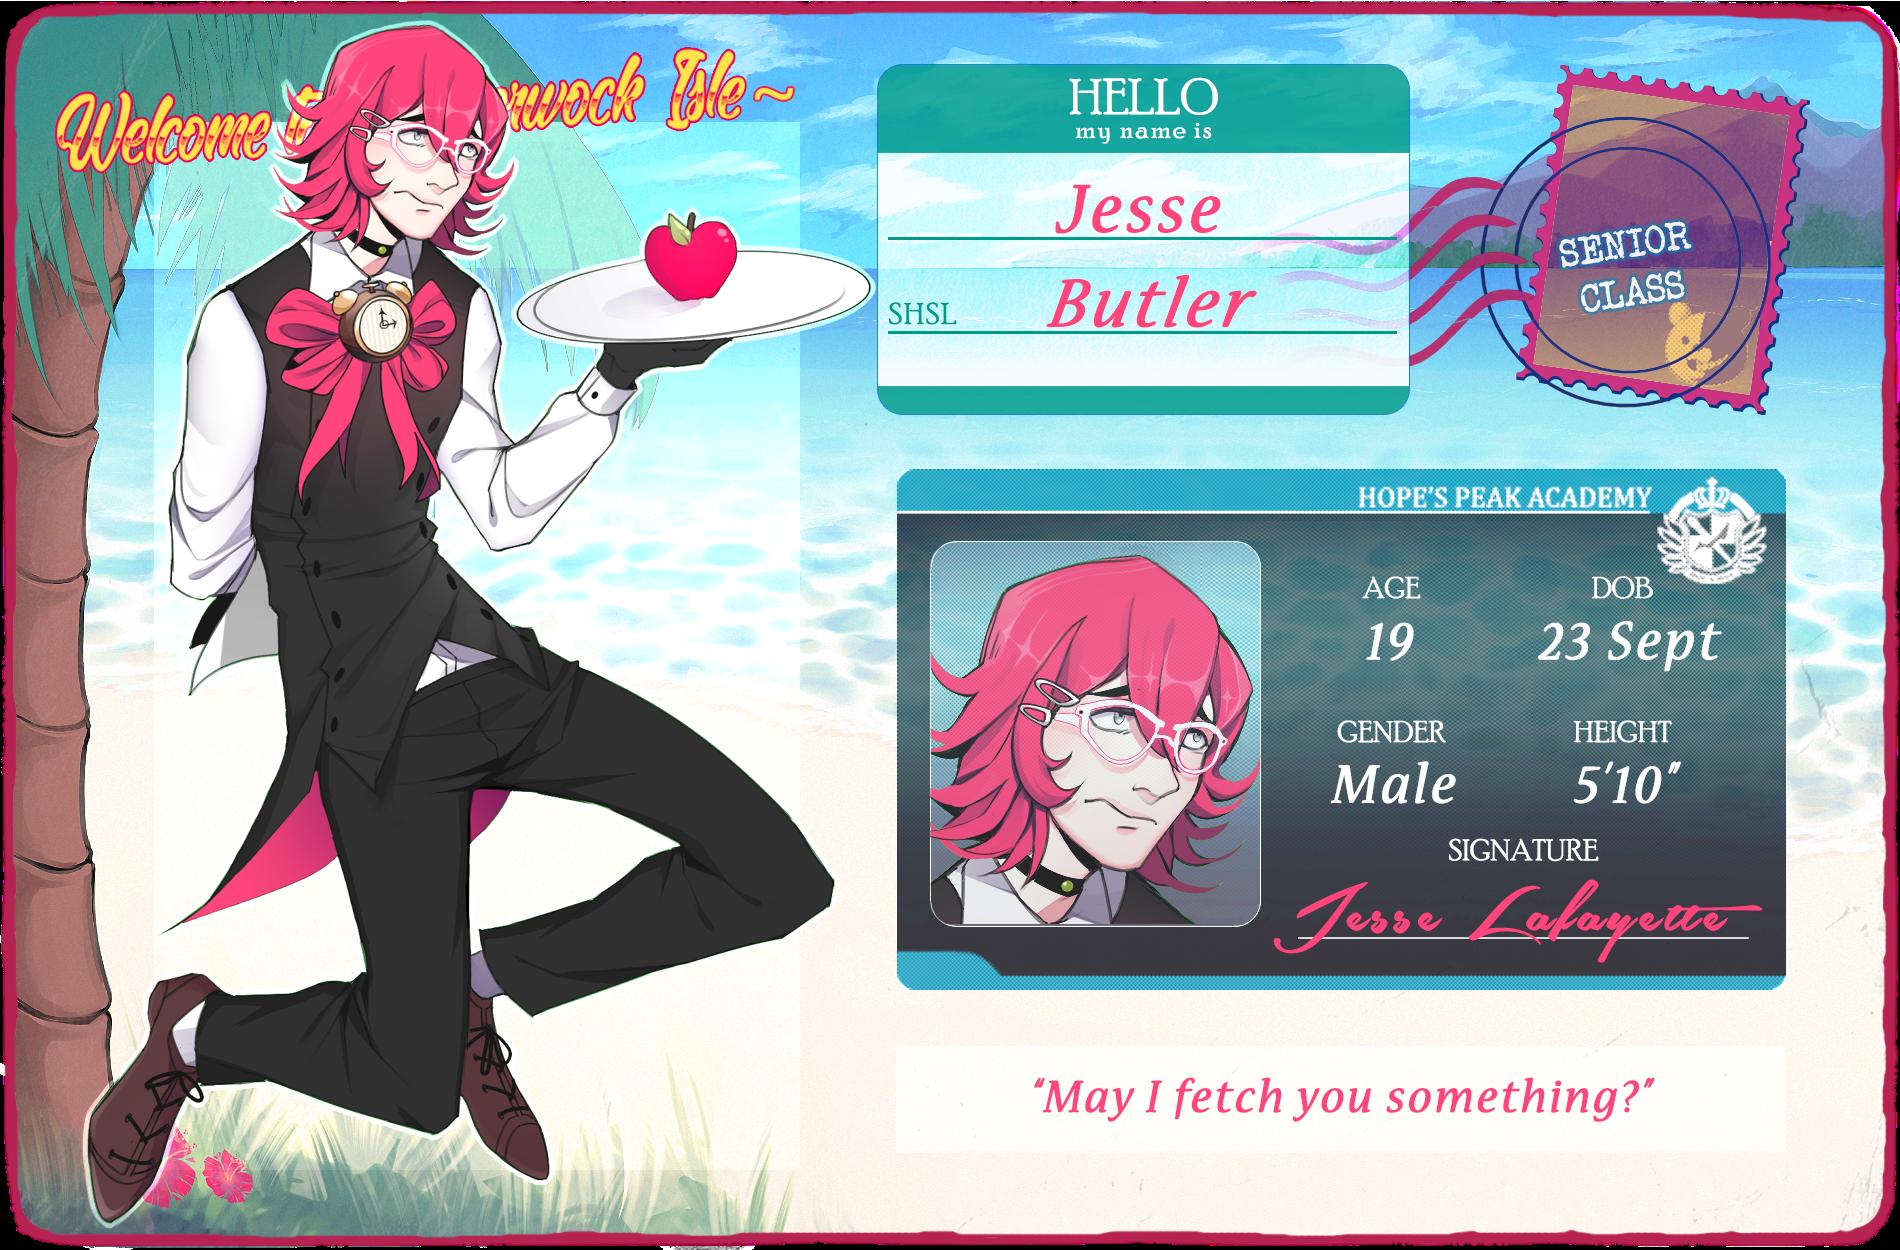 JI: MY MANS JESSE